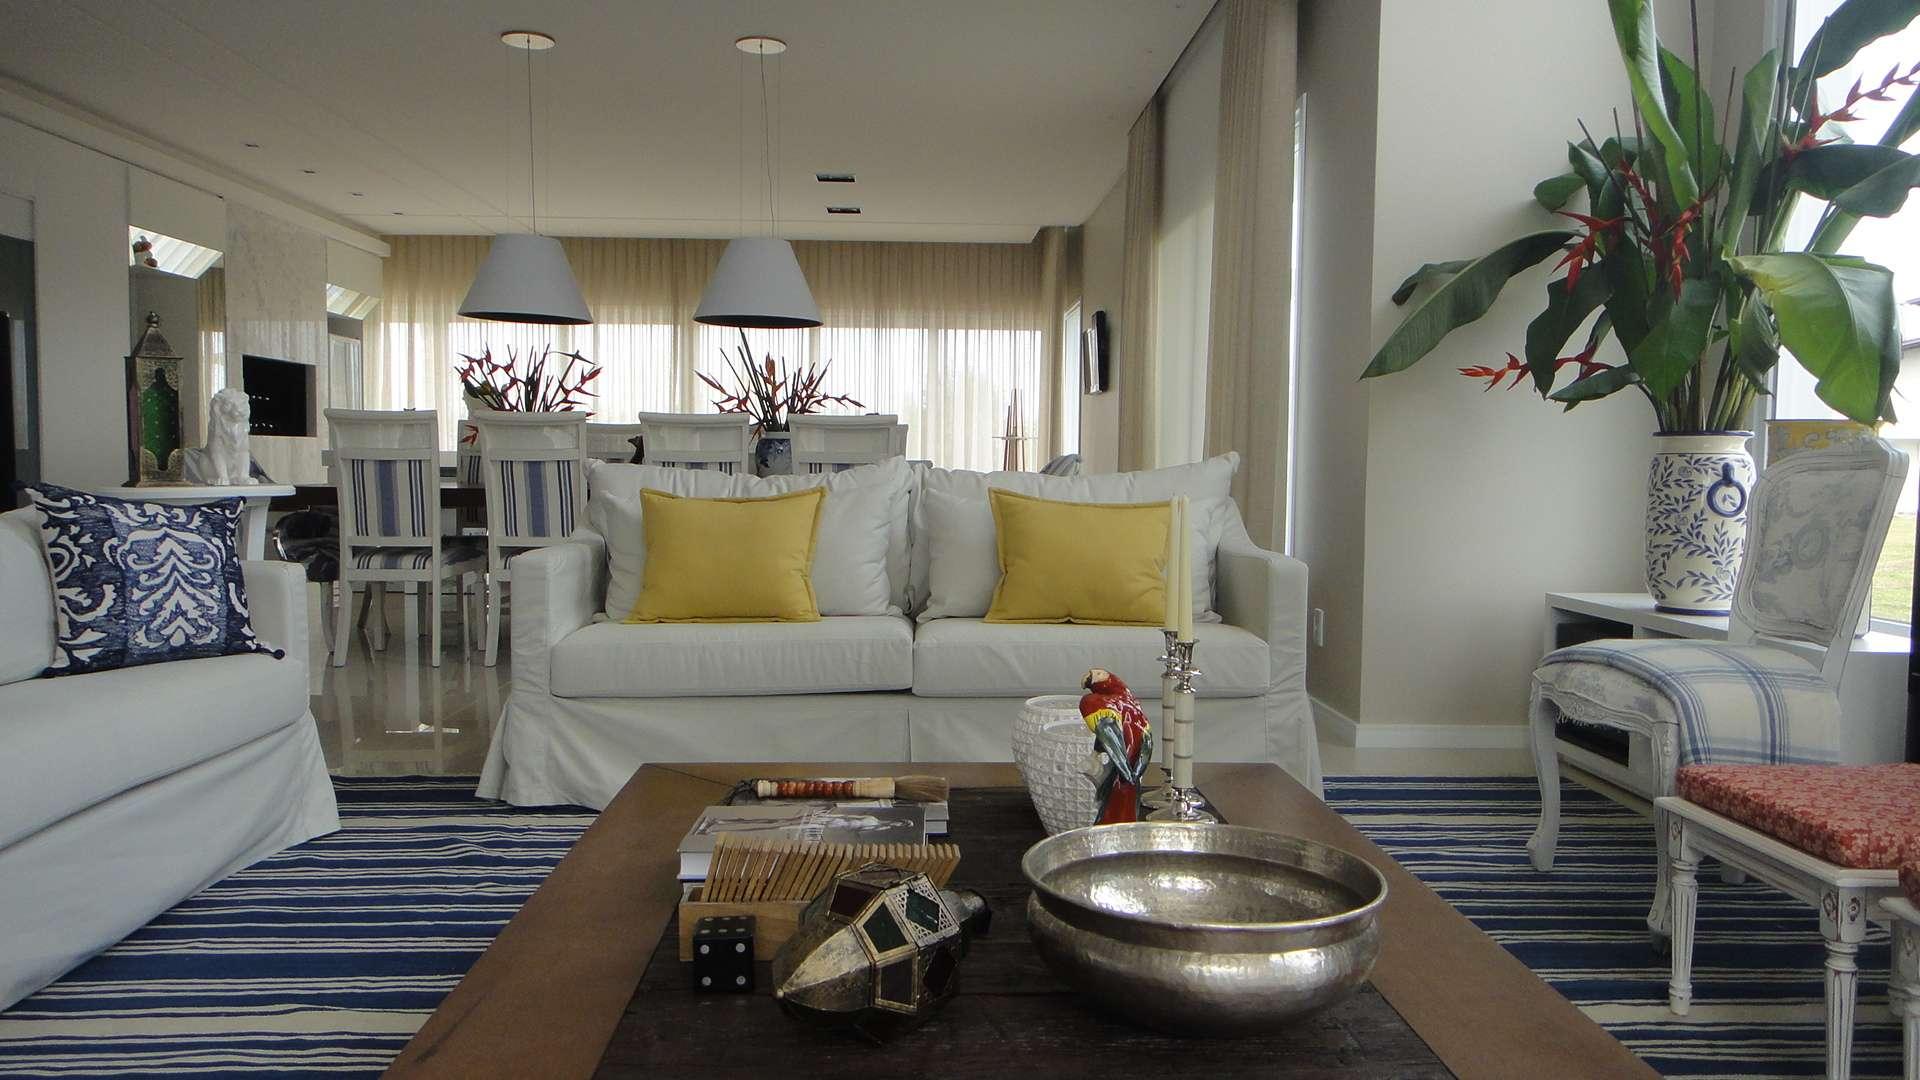 Condomínio Ocean Side, Itapeva-RS